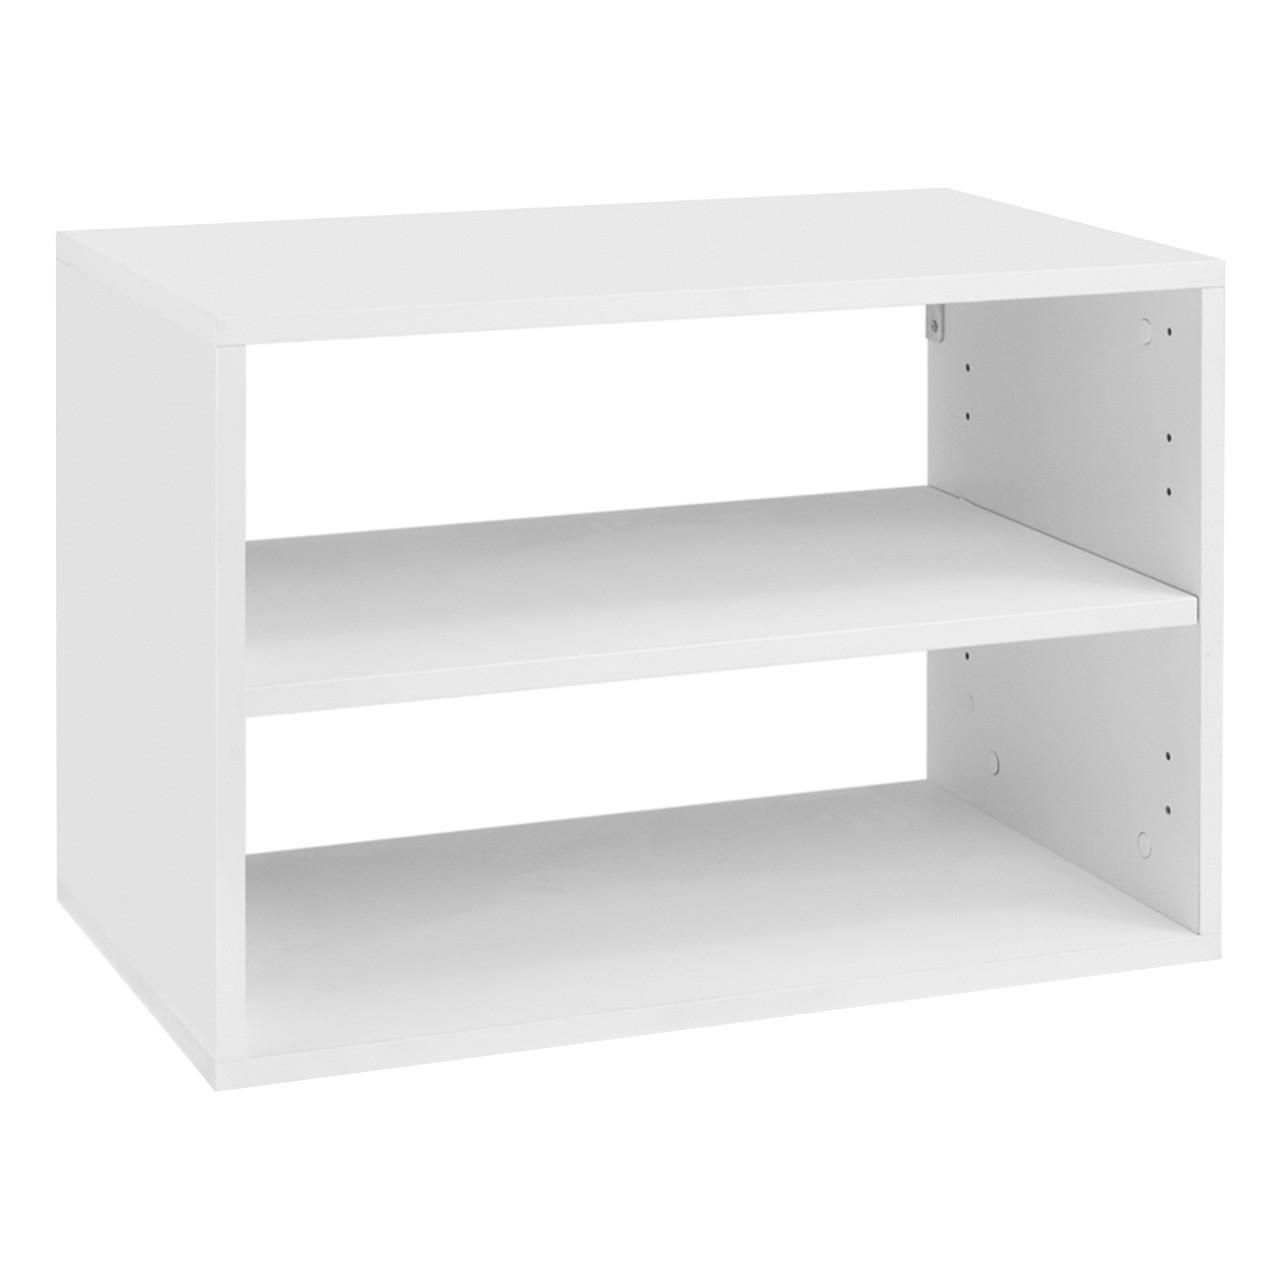 Big OBox Shelf Unit